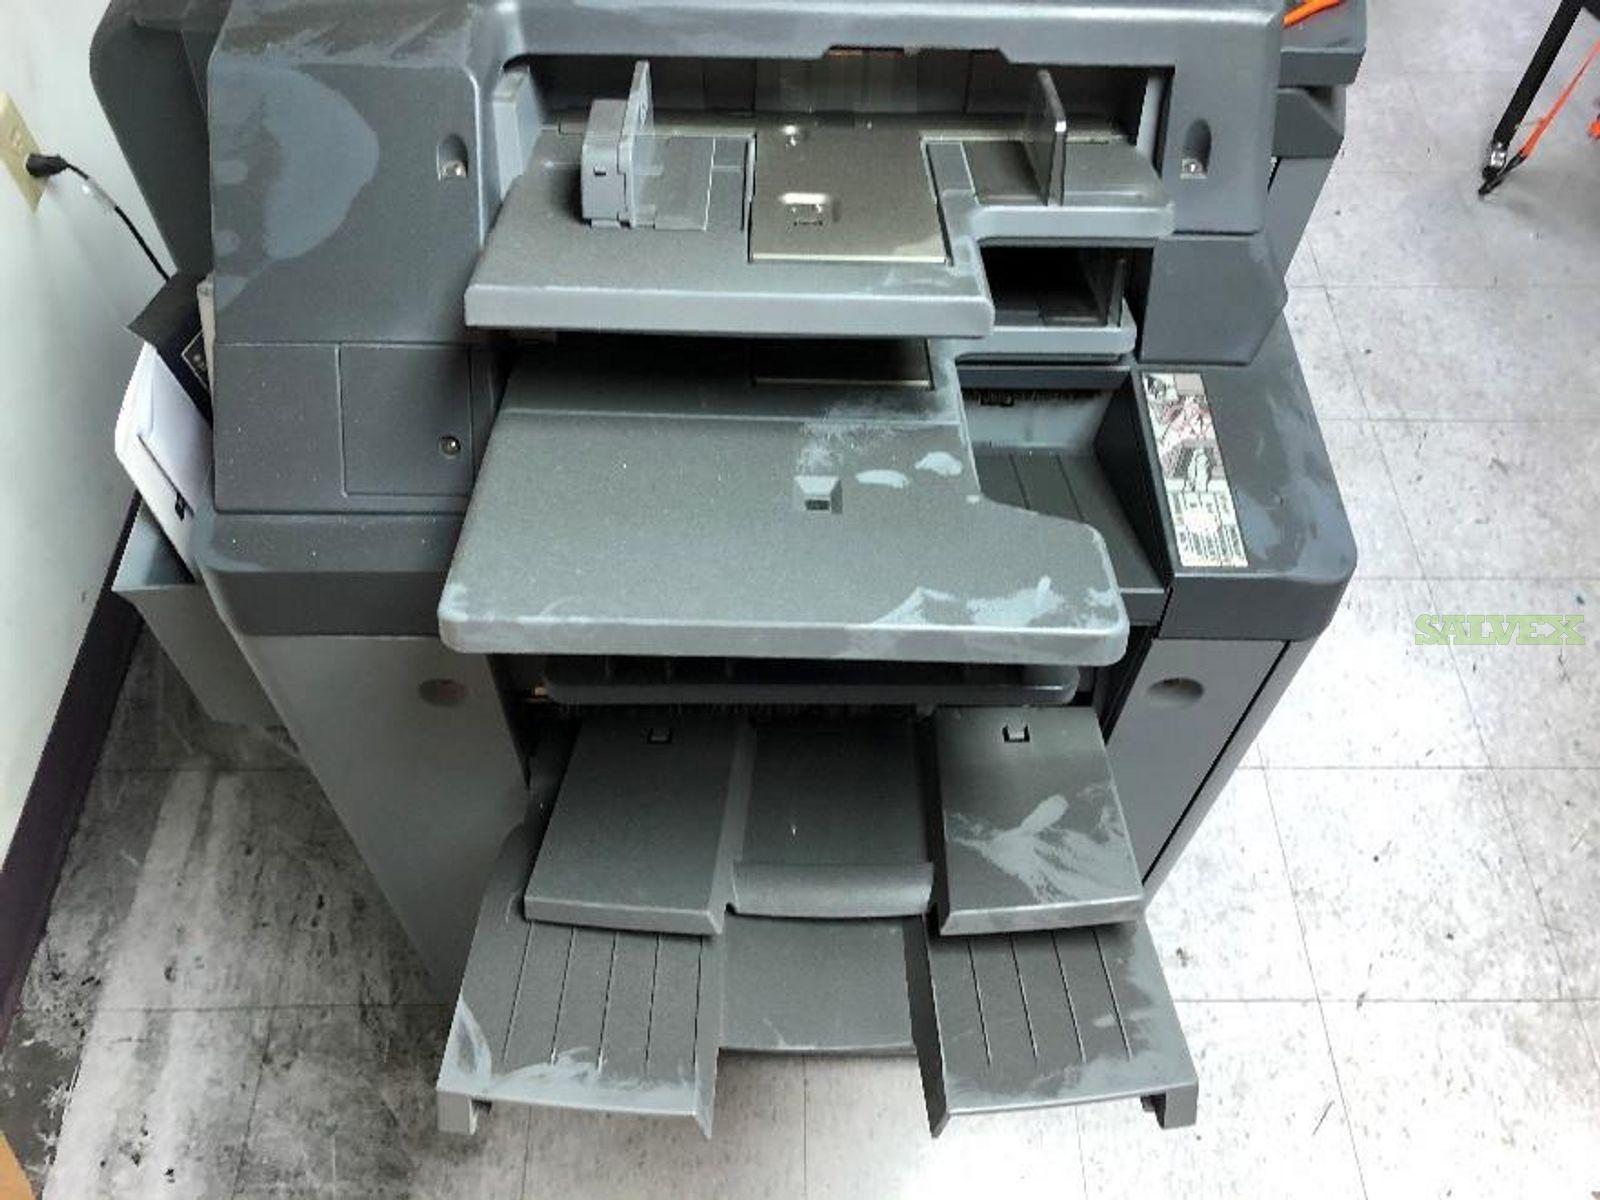 Printing Equipment: Print System, Labeller, Feeder, Color Laser Printer, Book Stitcher and More